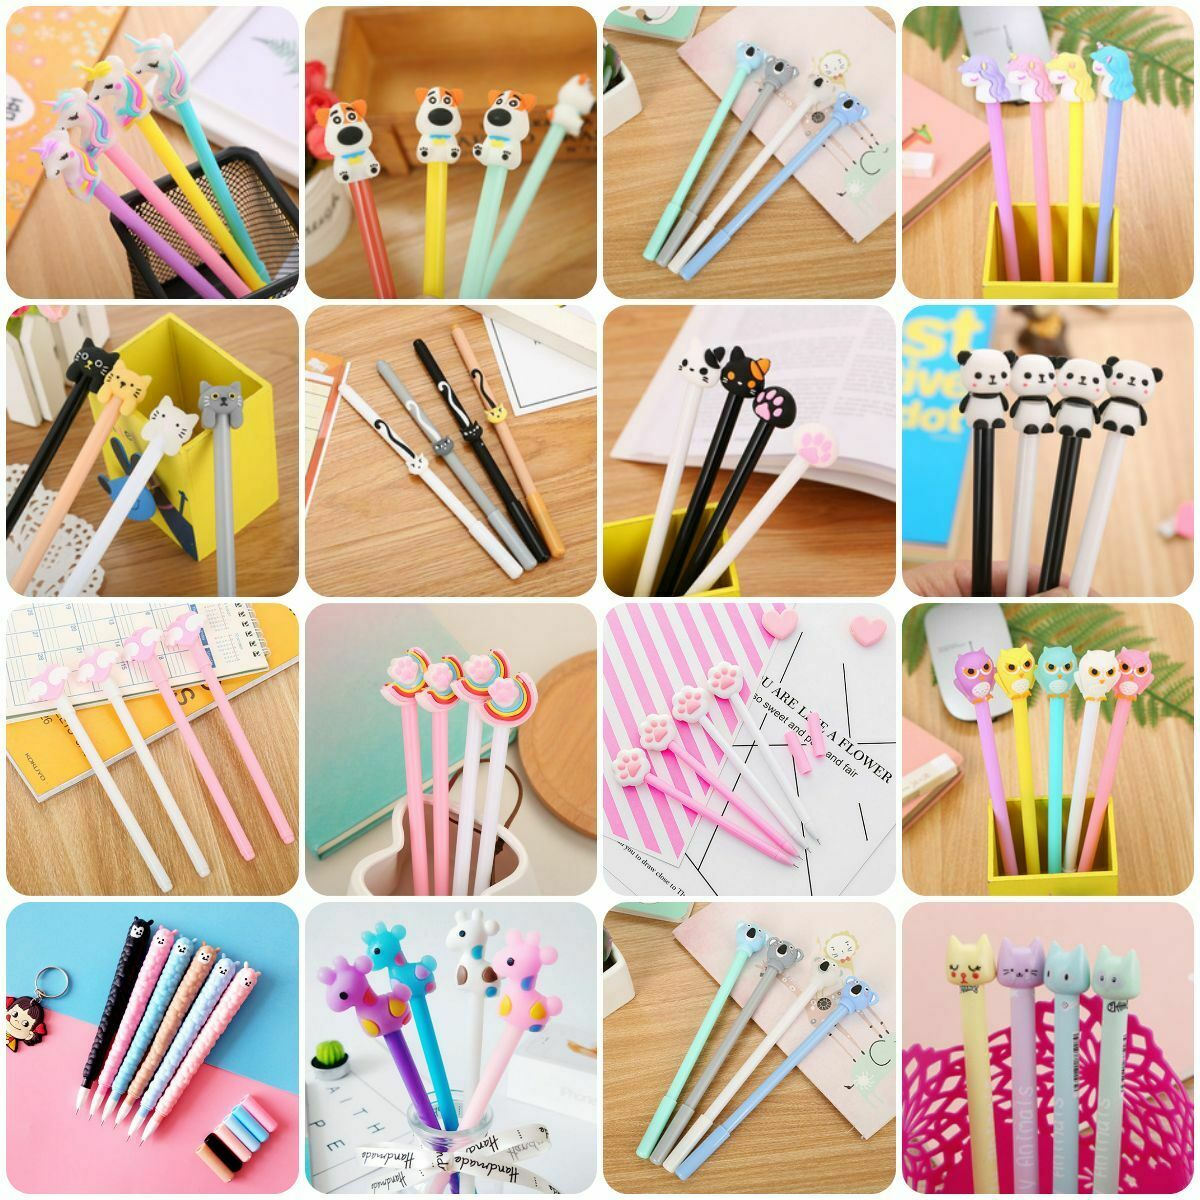 6Pcs Cute Style Gel Pen Ballpoint Stationery Writing Sign Child School Office